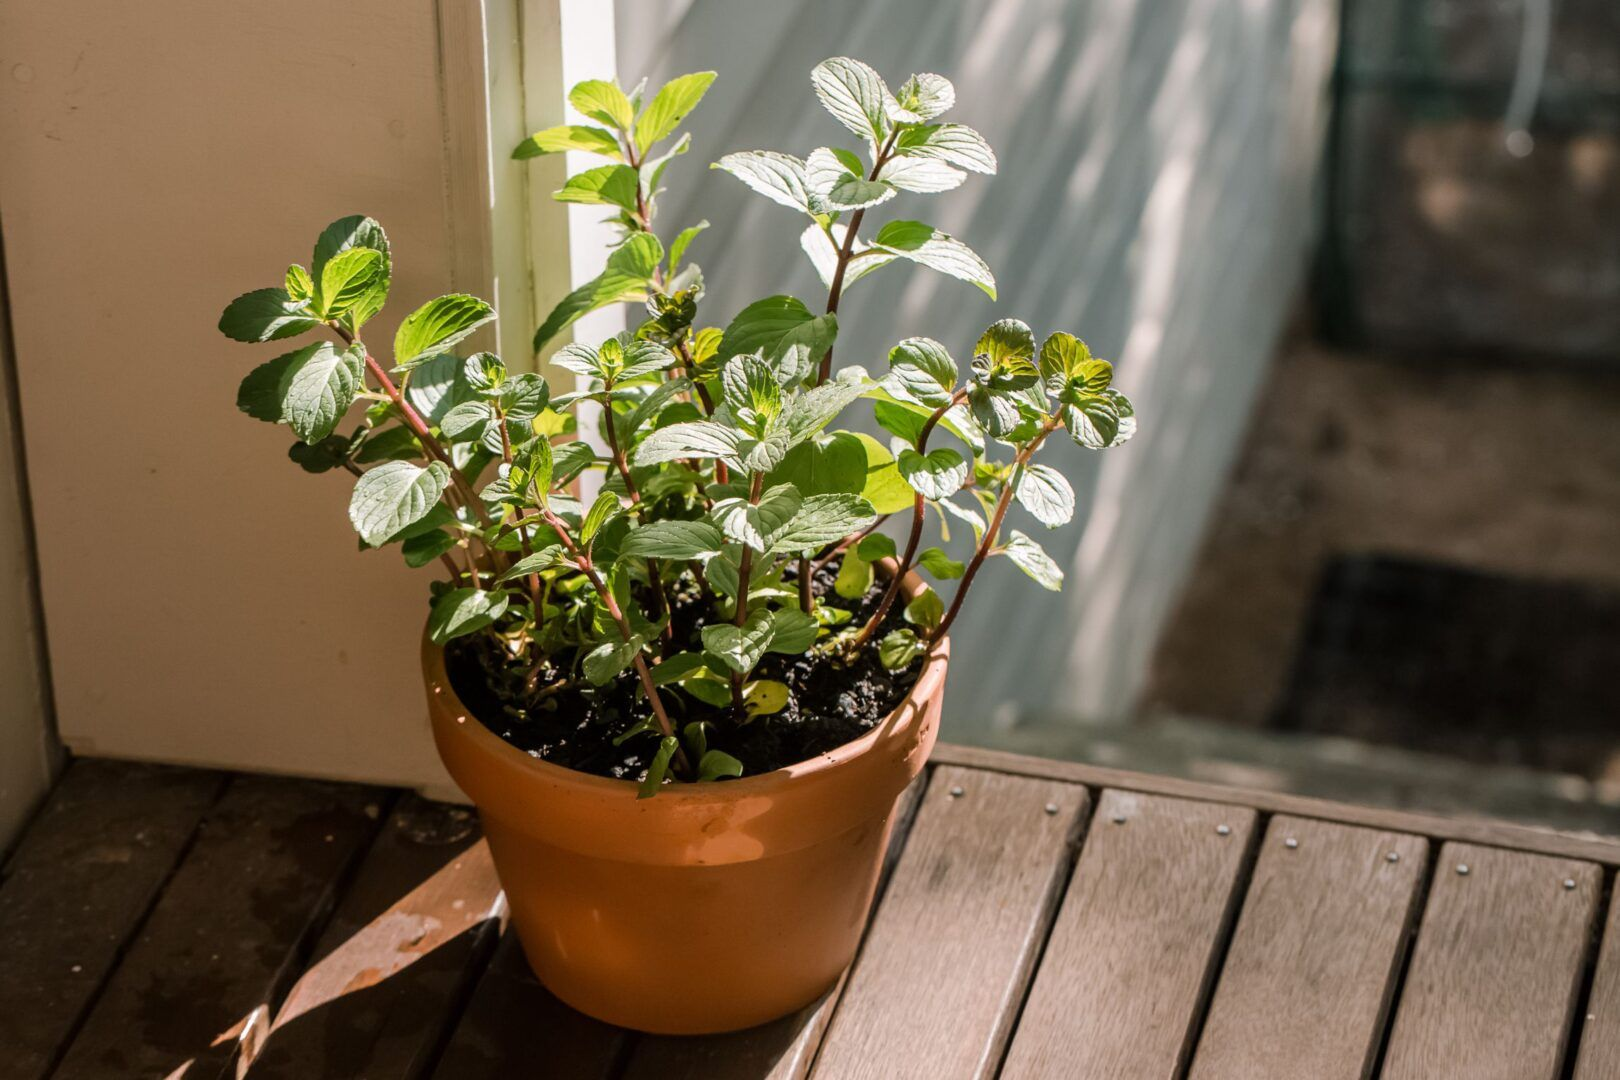 Como plantar hortelã: o cultivo da erva aromática e medicinal